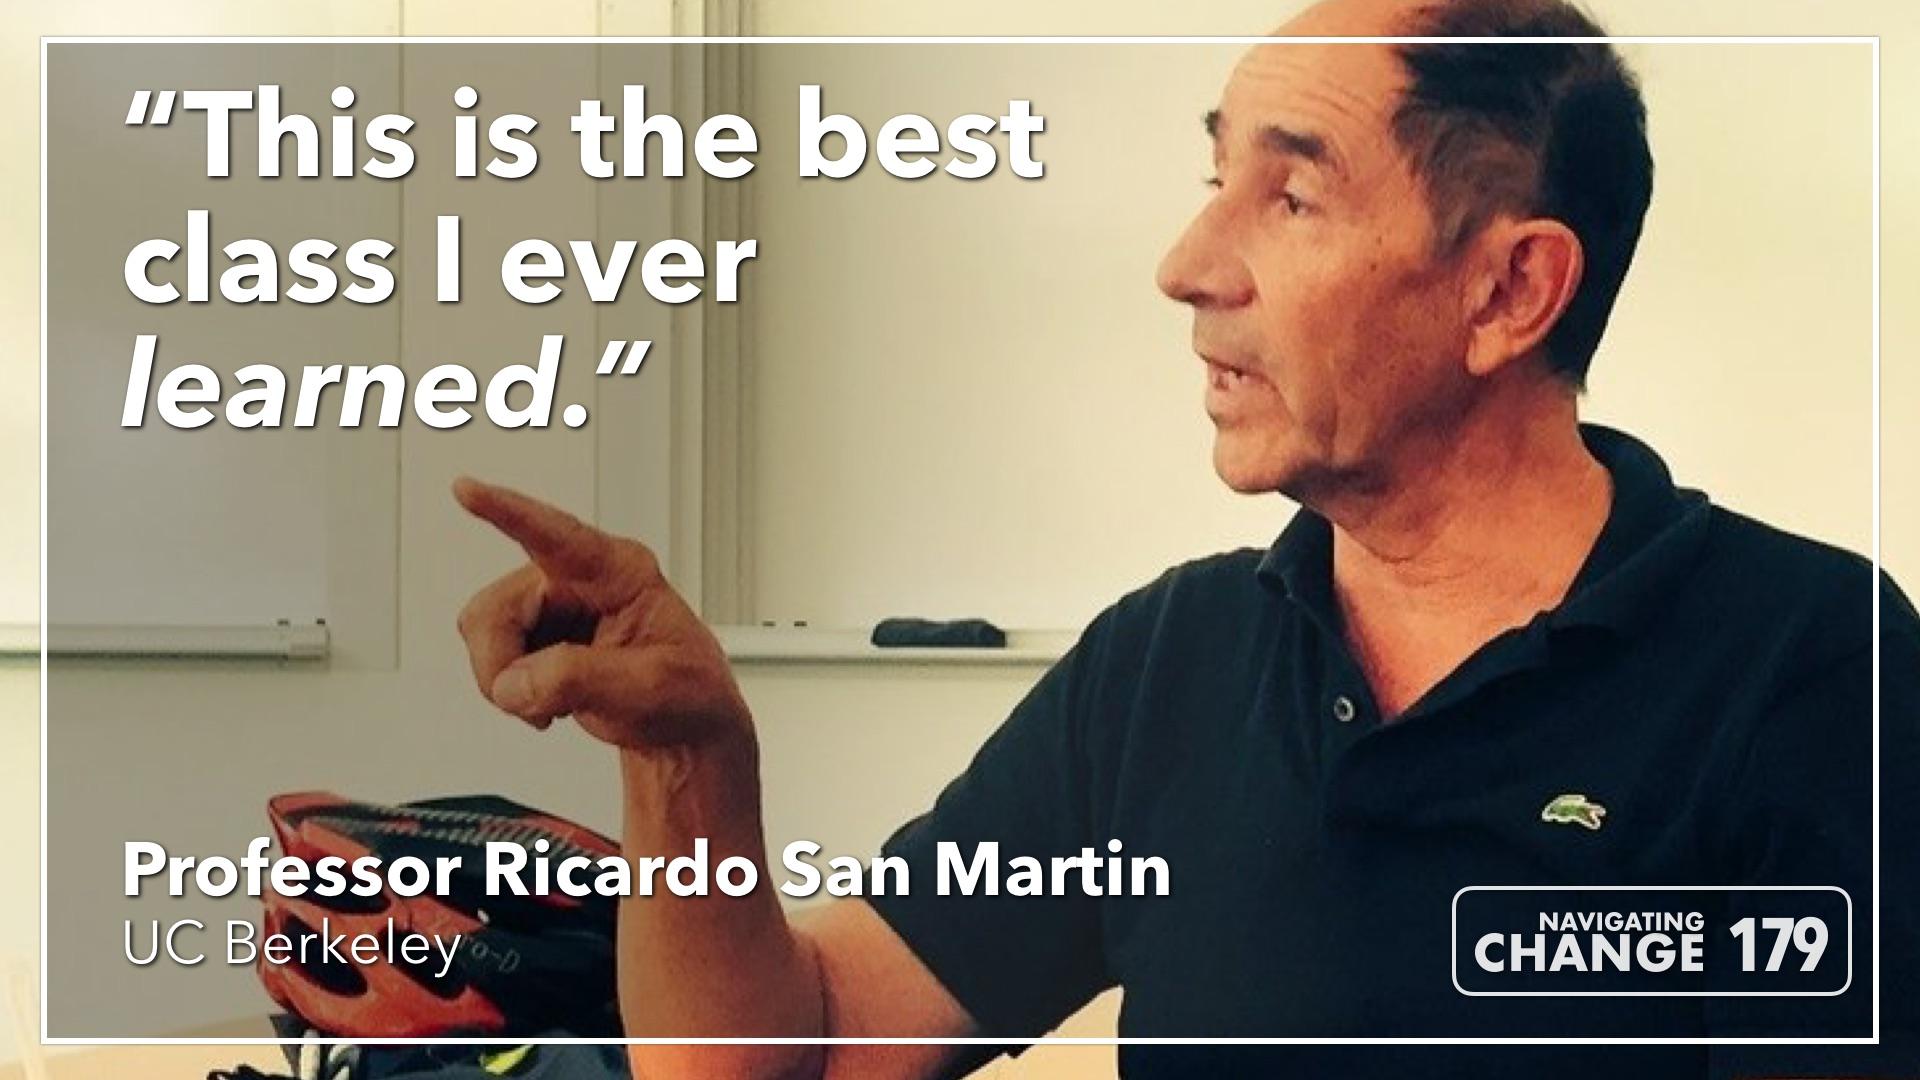 Listen to Ricardo San Martin on Navigating Change: The Education Podcast